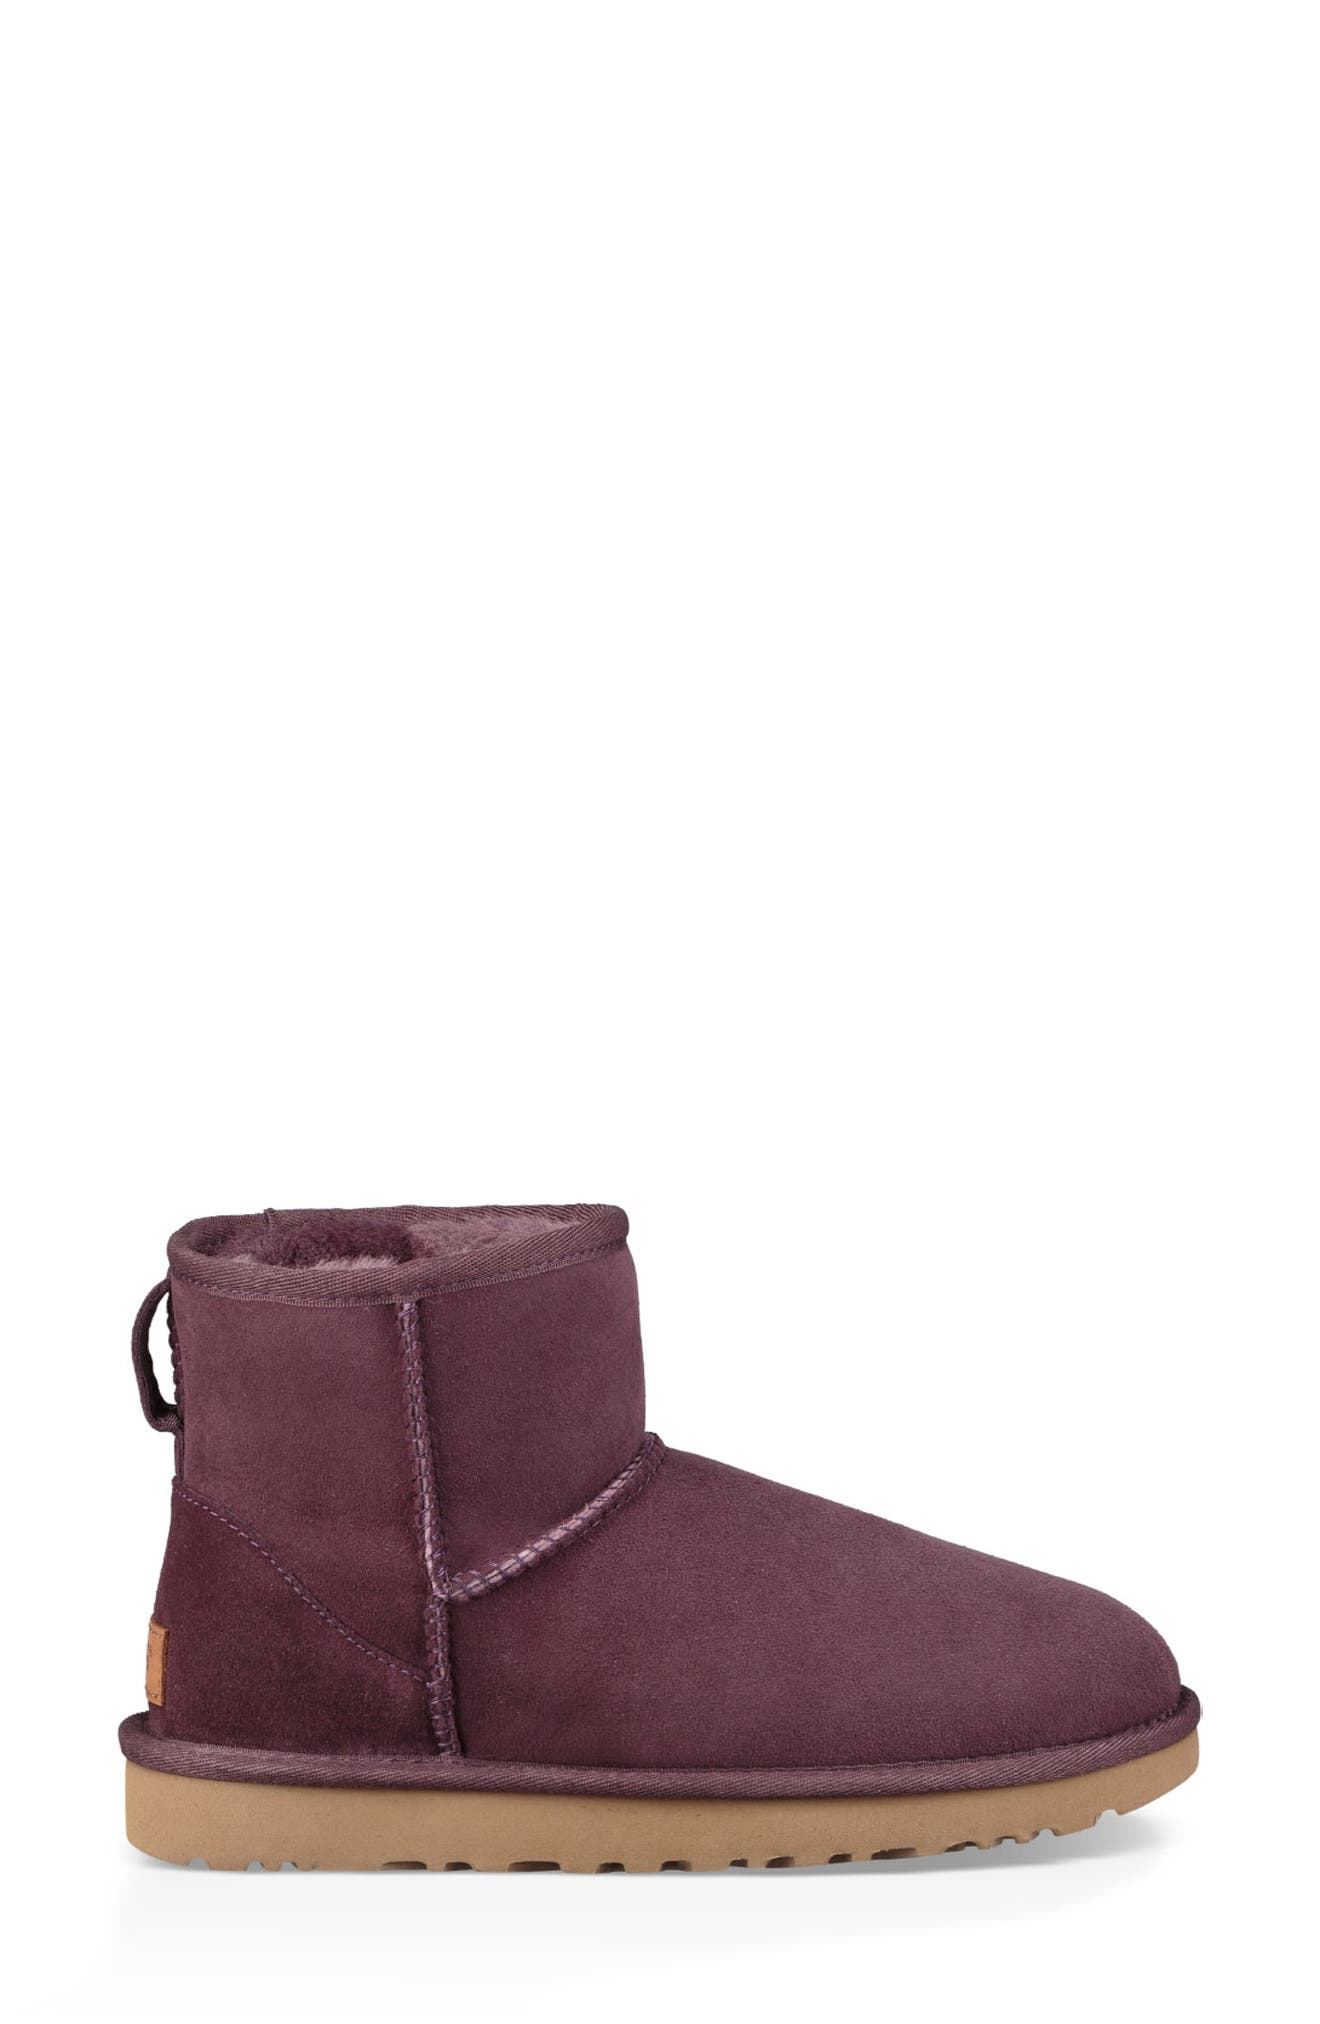 ,                             Classic Mini II Genuine Shearling Lined Boot,                             Alternate thumbnail 65, color,                             553